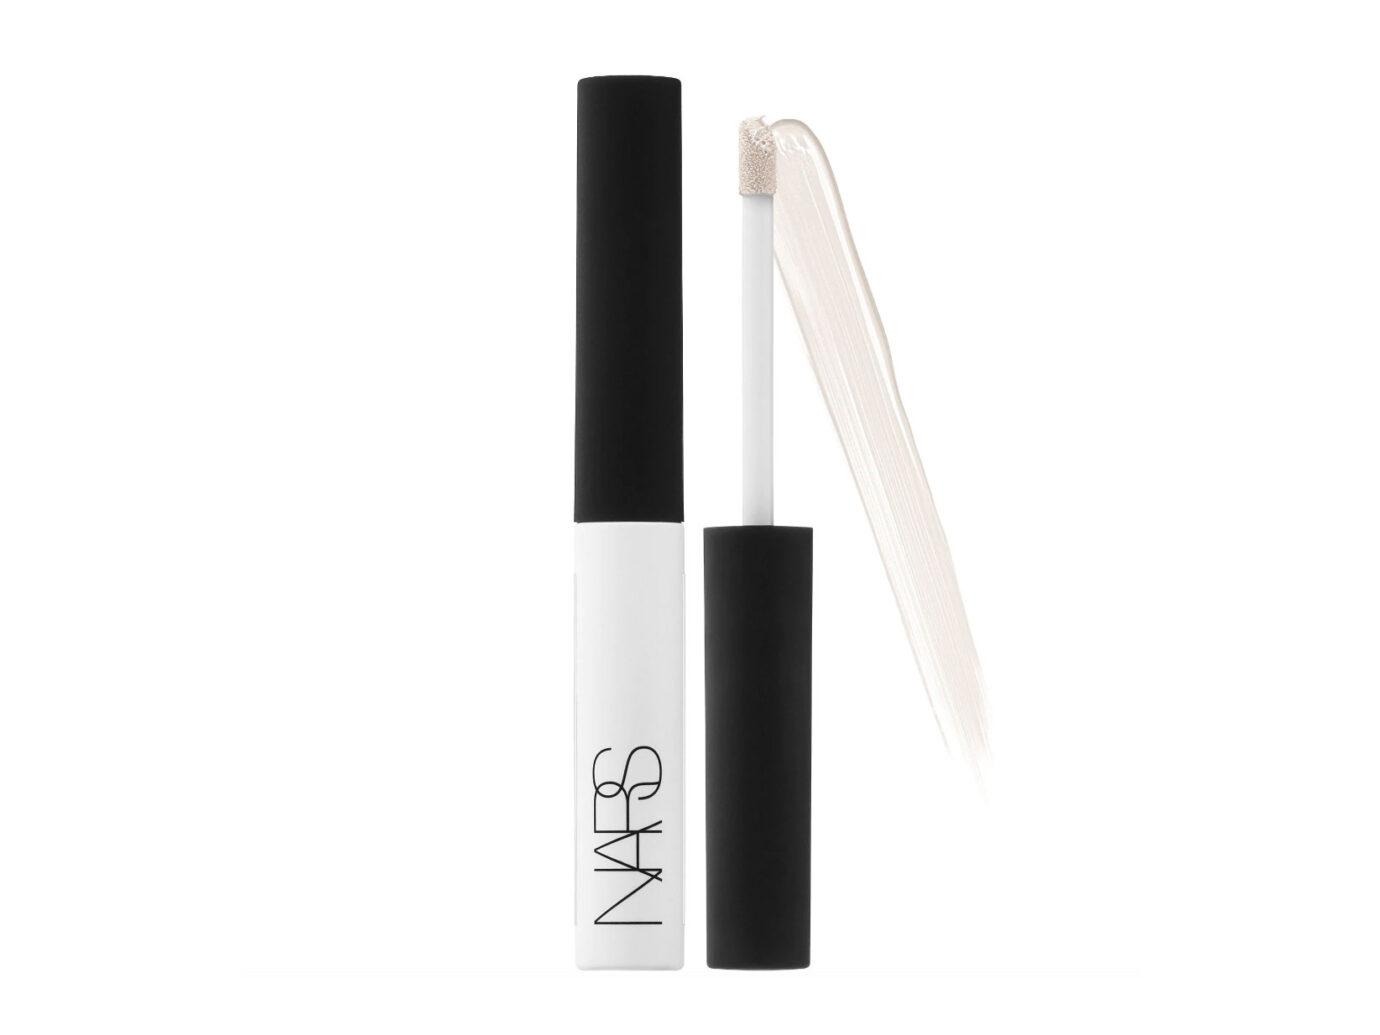 NARS Pro-Prime Smudge Proof Eyeshadow Base